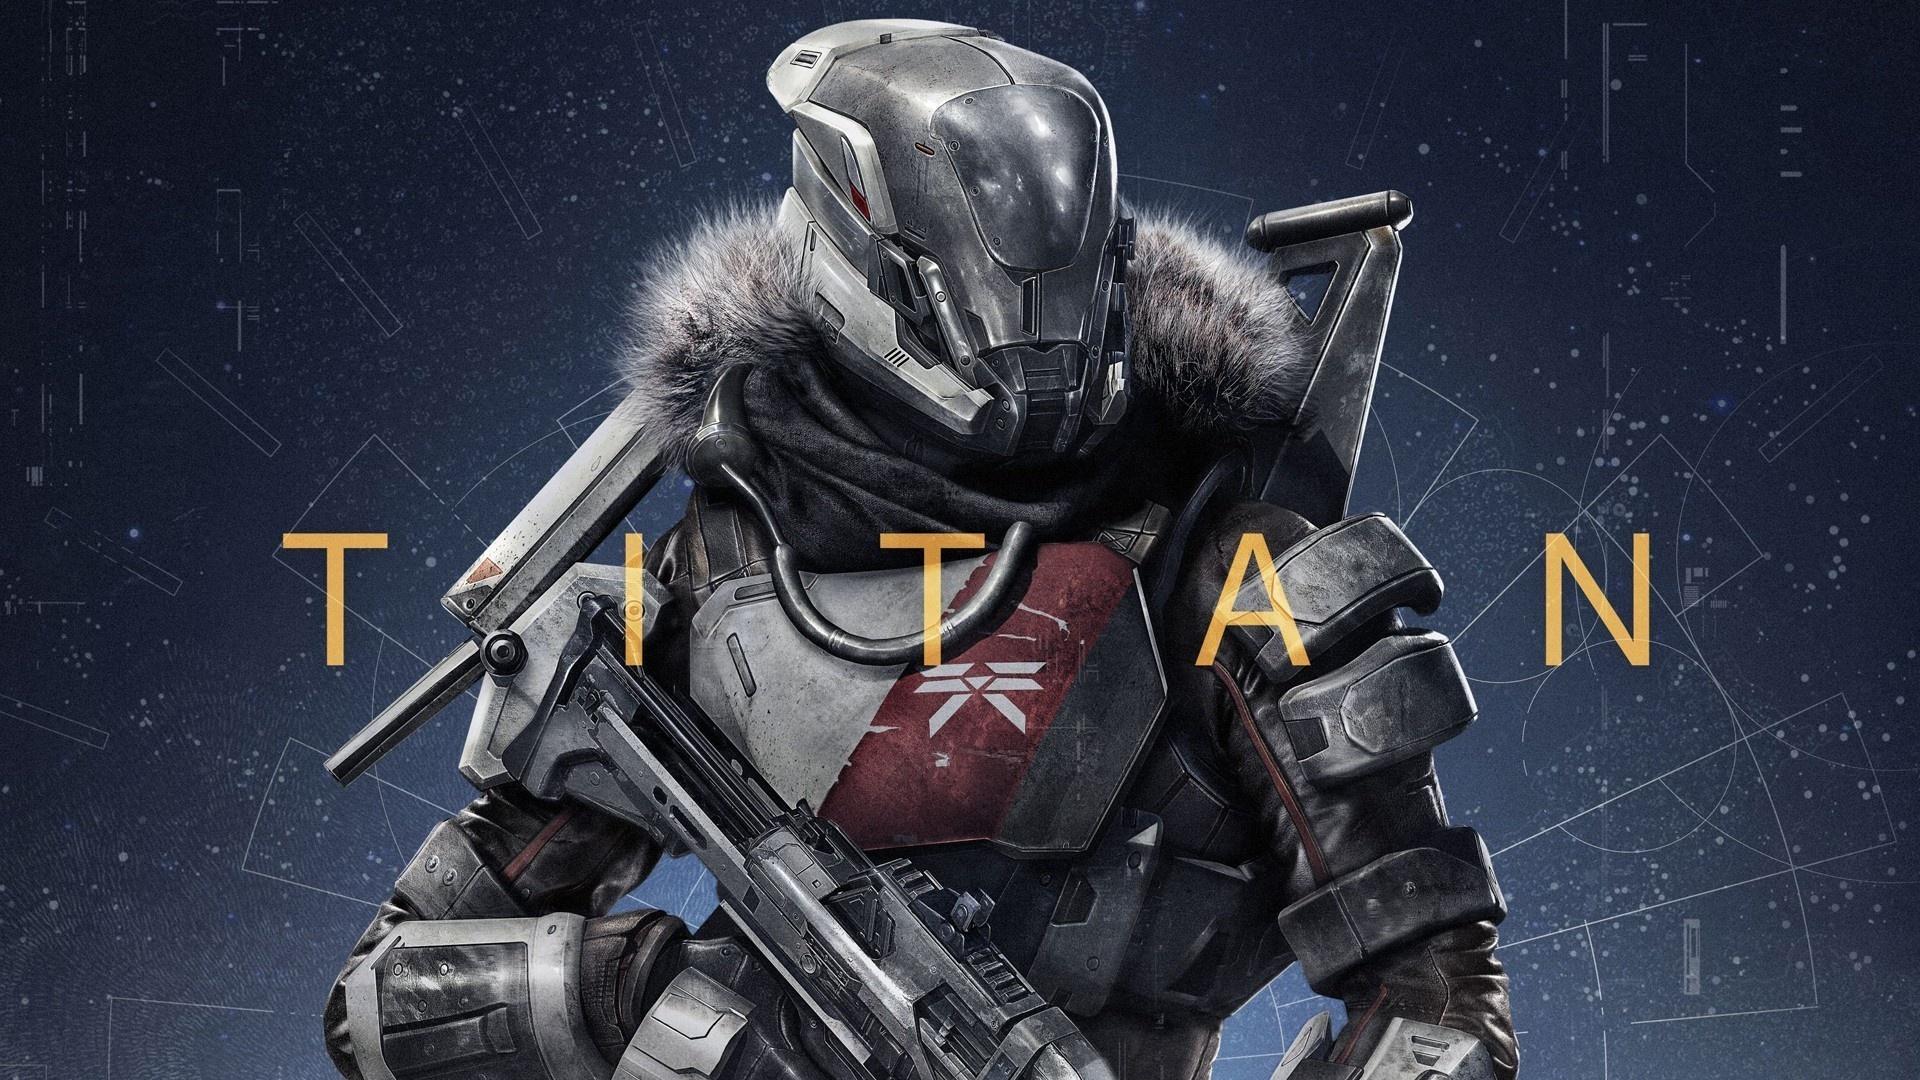 Titan in Destiny Game Wallpaper ImageBankbiz 1920x1080